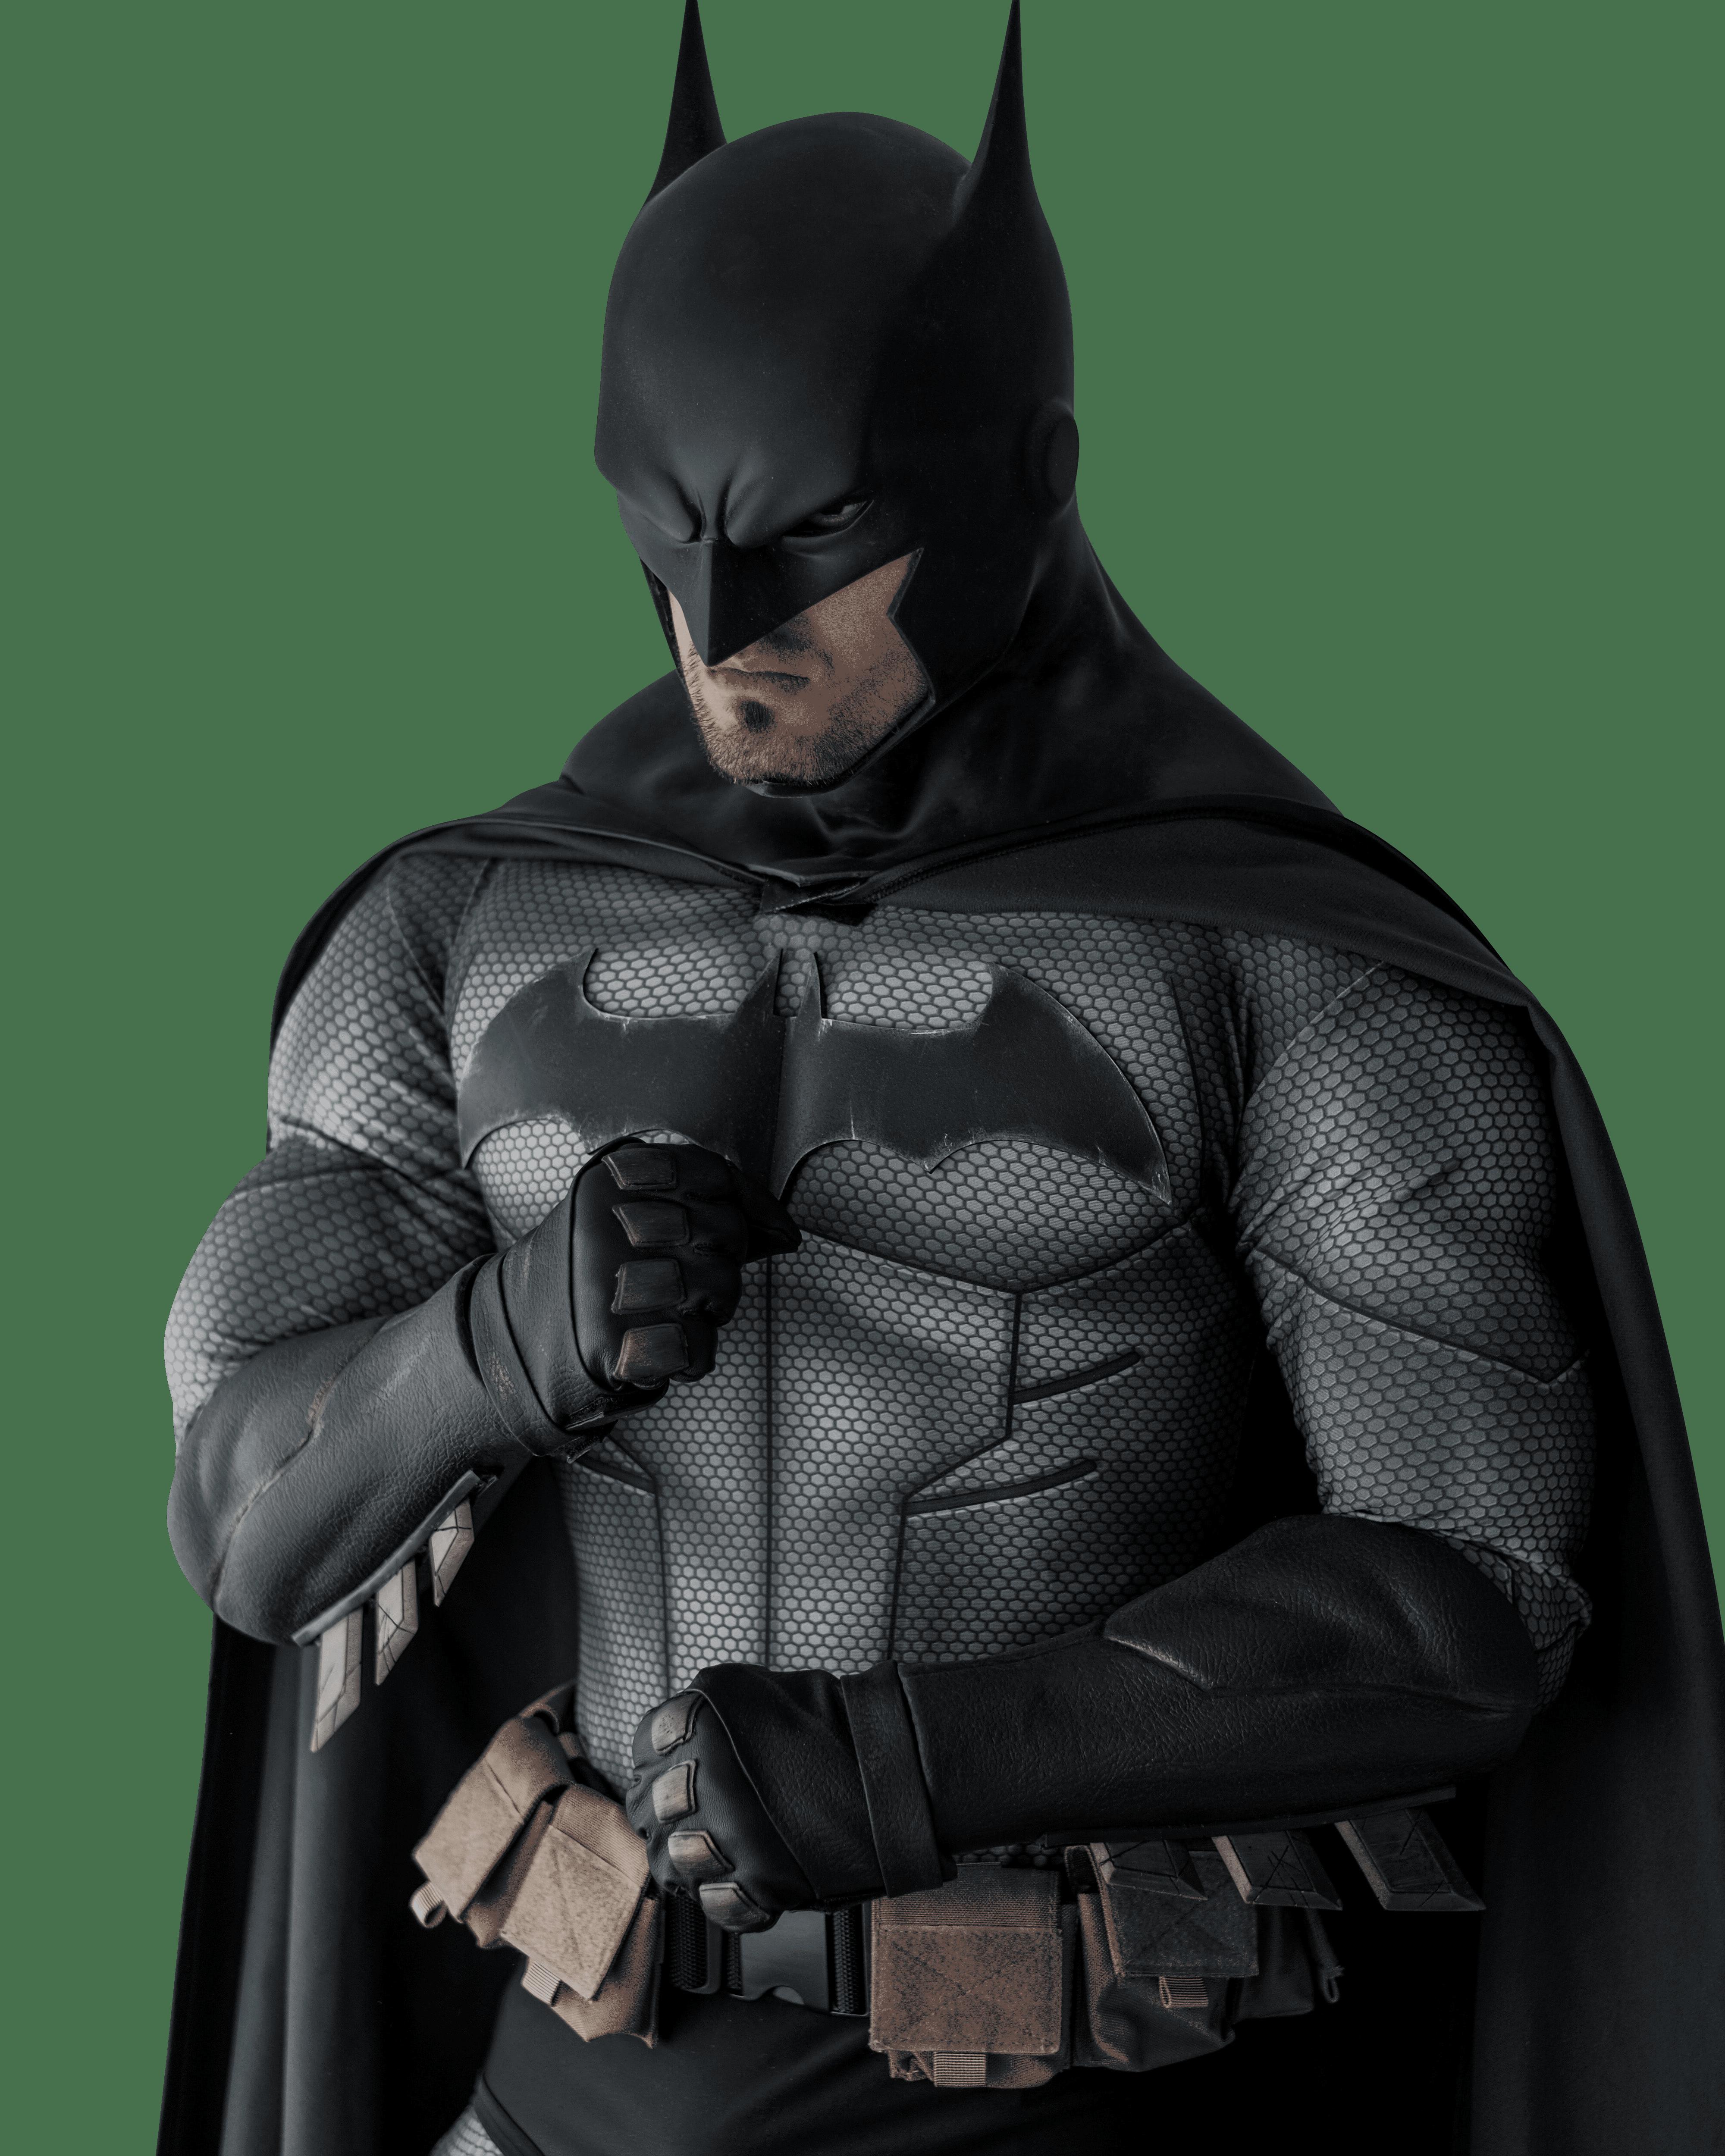 Batman movie still transparent background.png